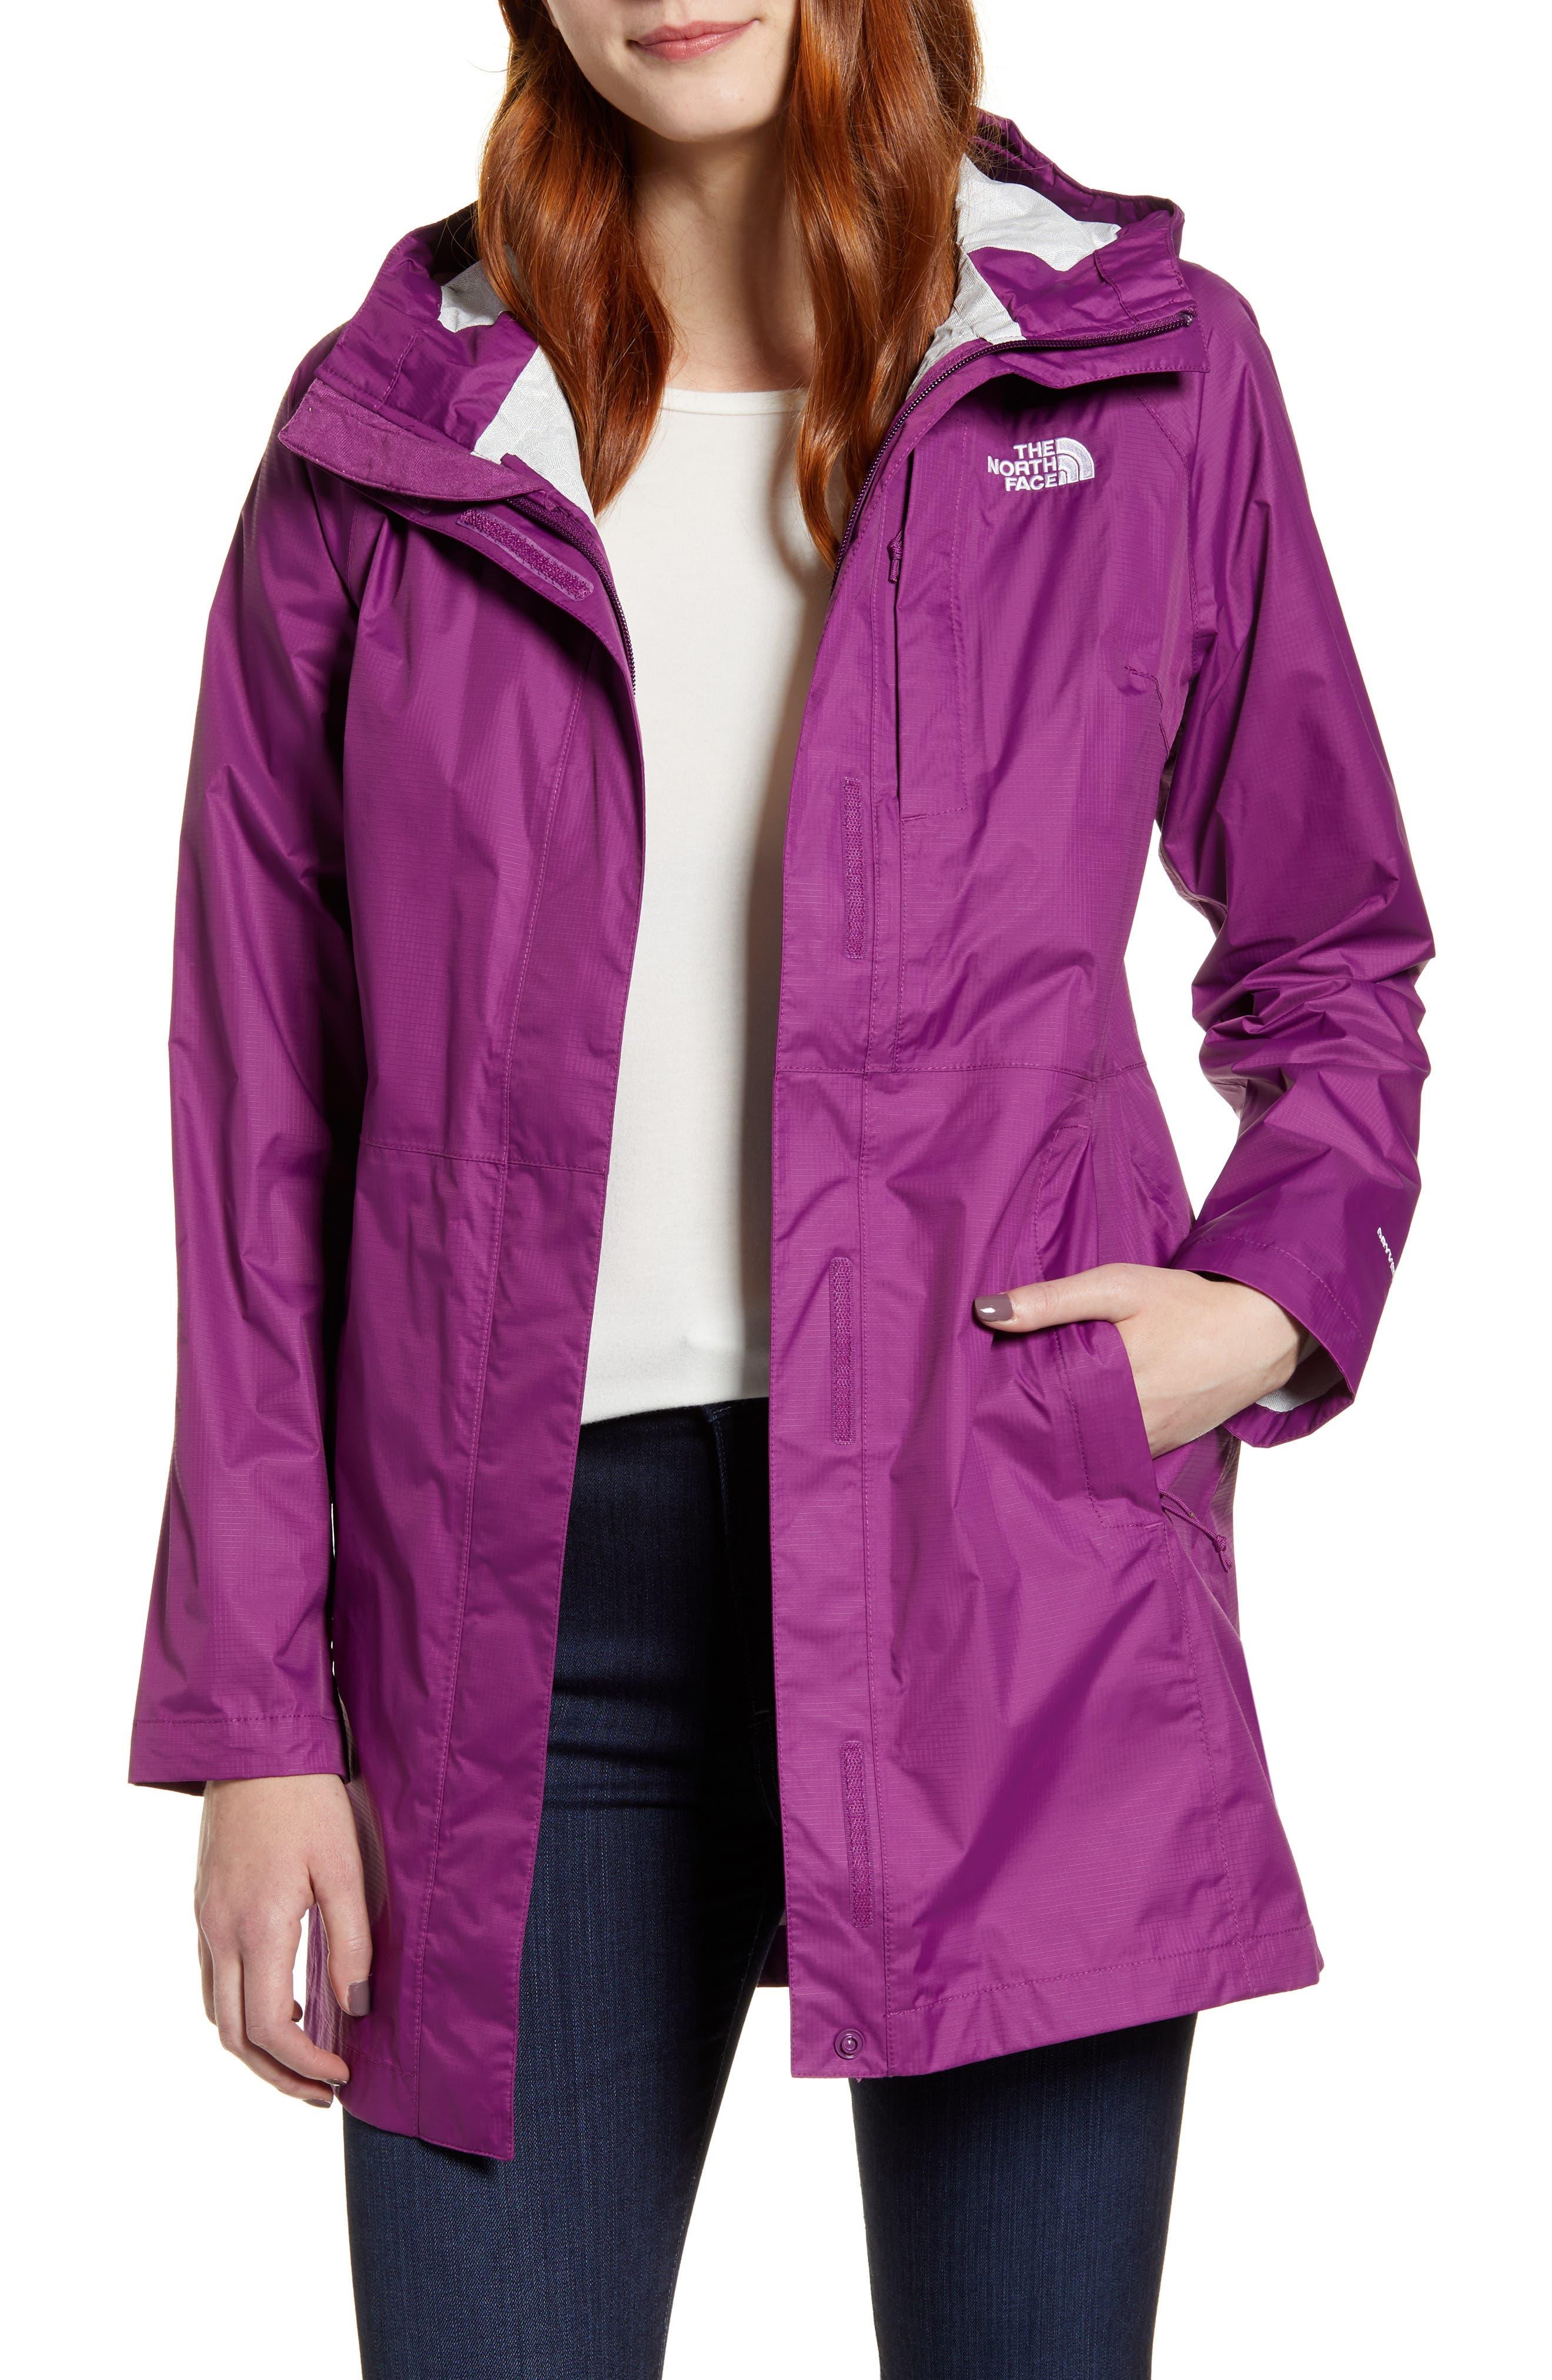 The North Face Venture Weatherproof Rain Jacket (Nordstrom Exclusive Colors)